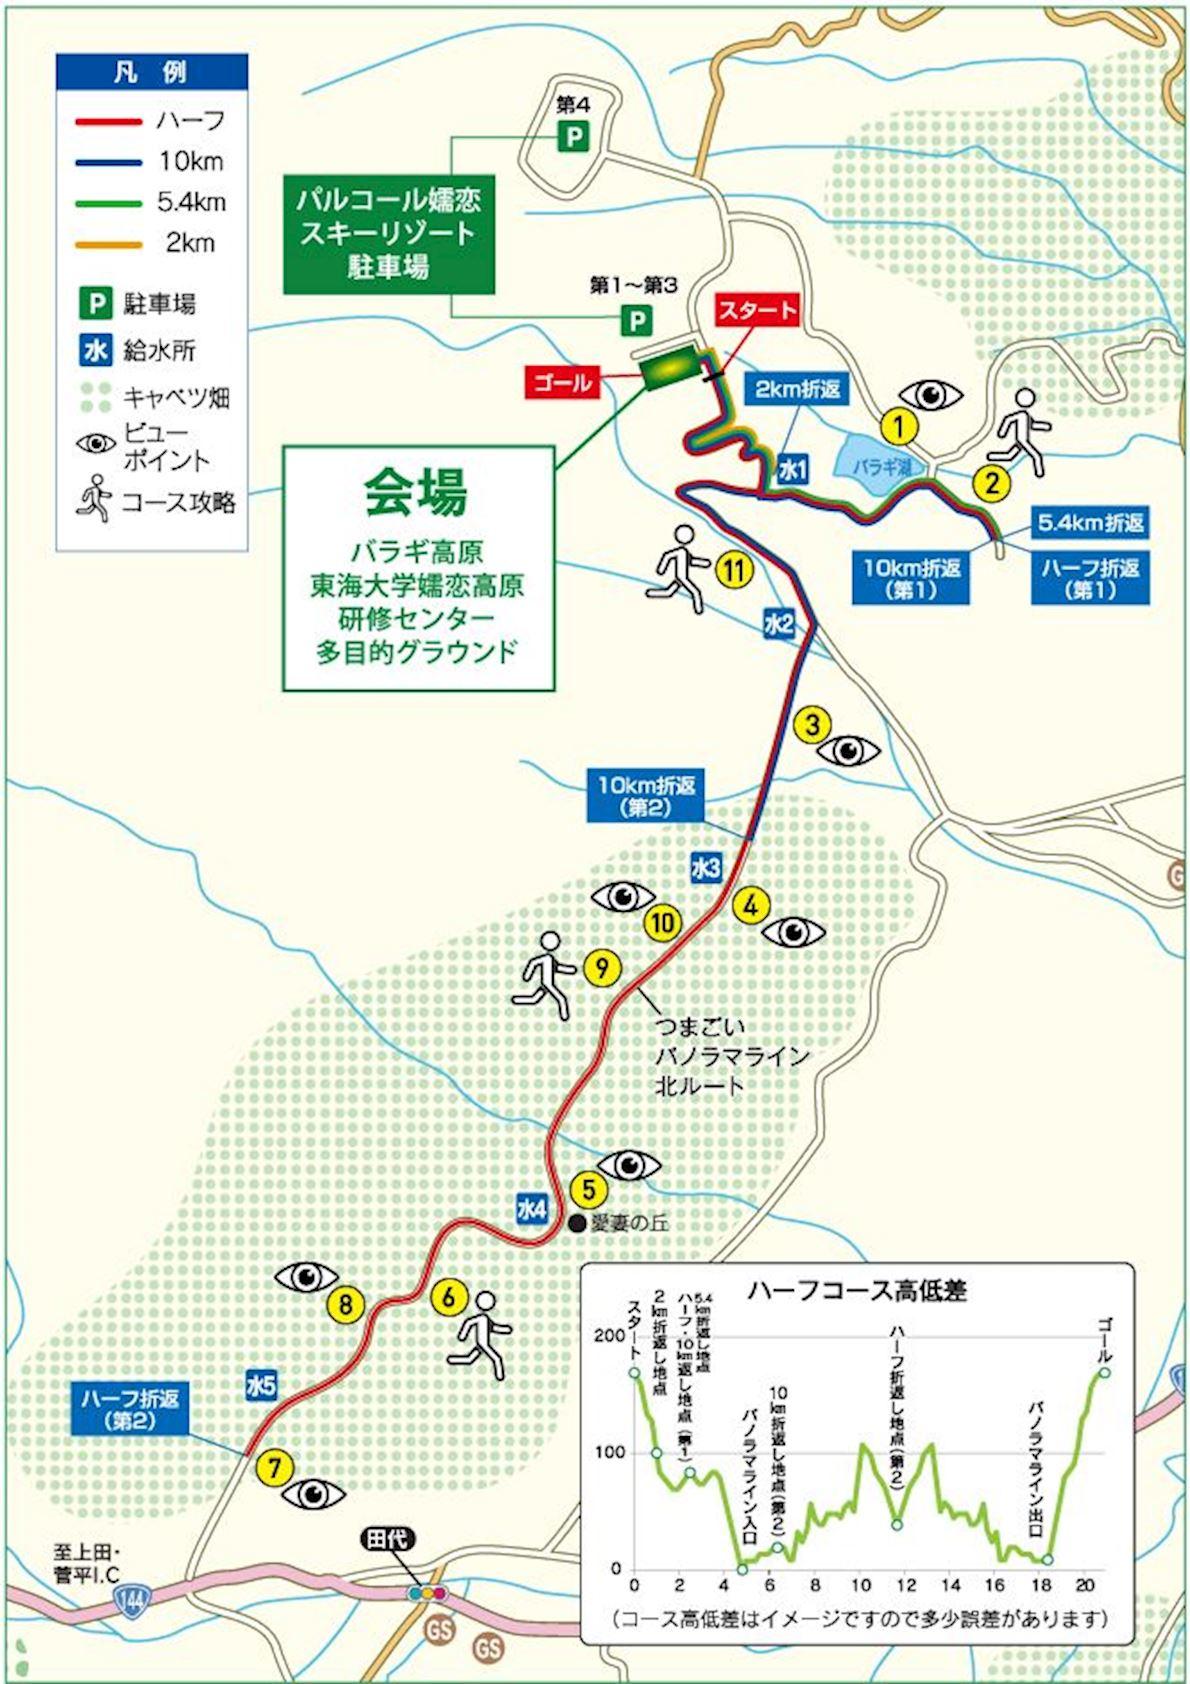 Cabbage Marathon Route Map